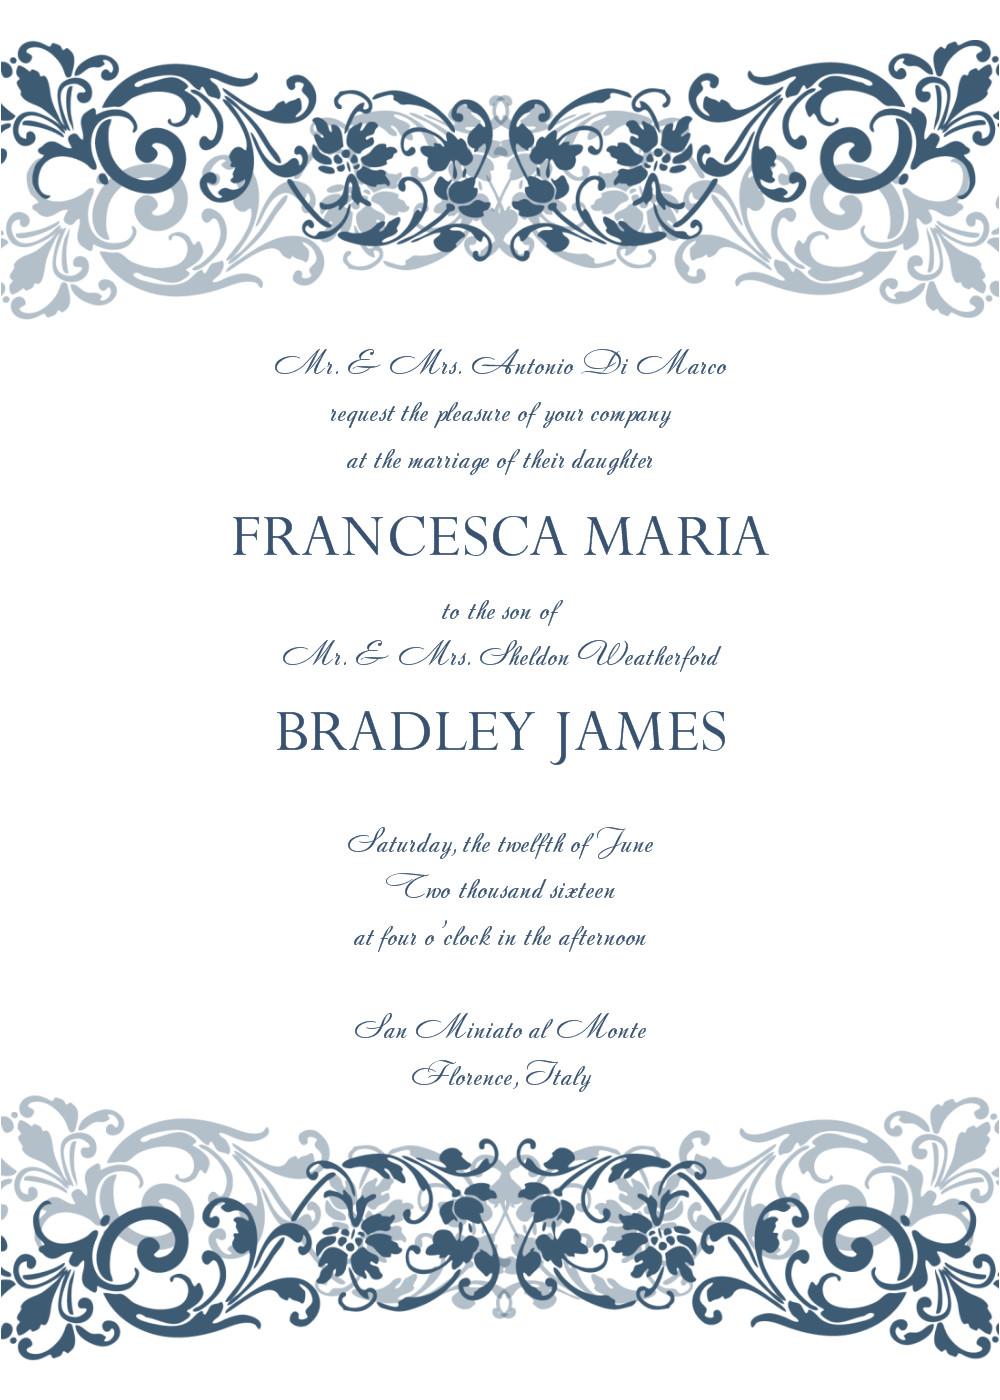 Wedding Invitation Template On Word 8 Free Wedding Invitation Templates Excel Pdf formats